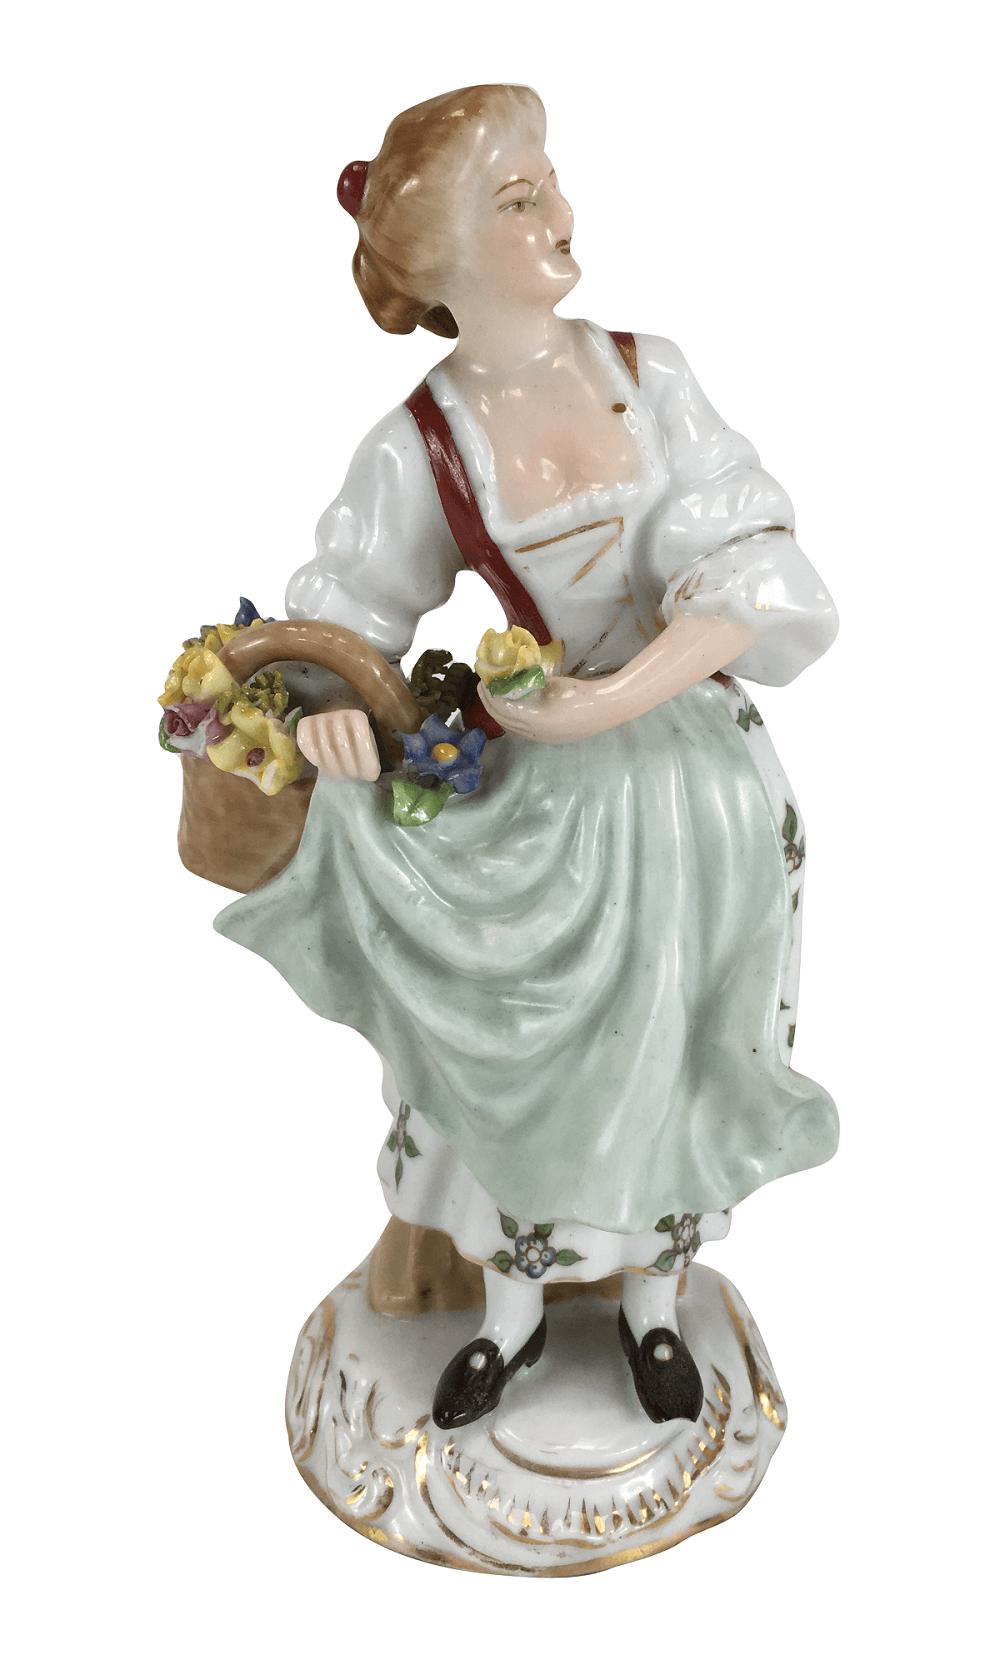 Escultura Bibelo Porcelana Antiga Dama Com Flores